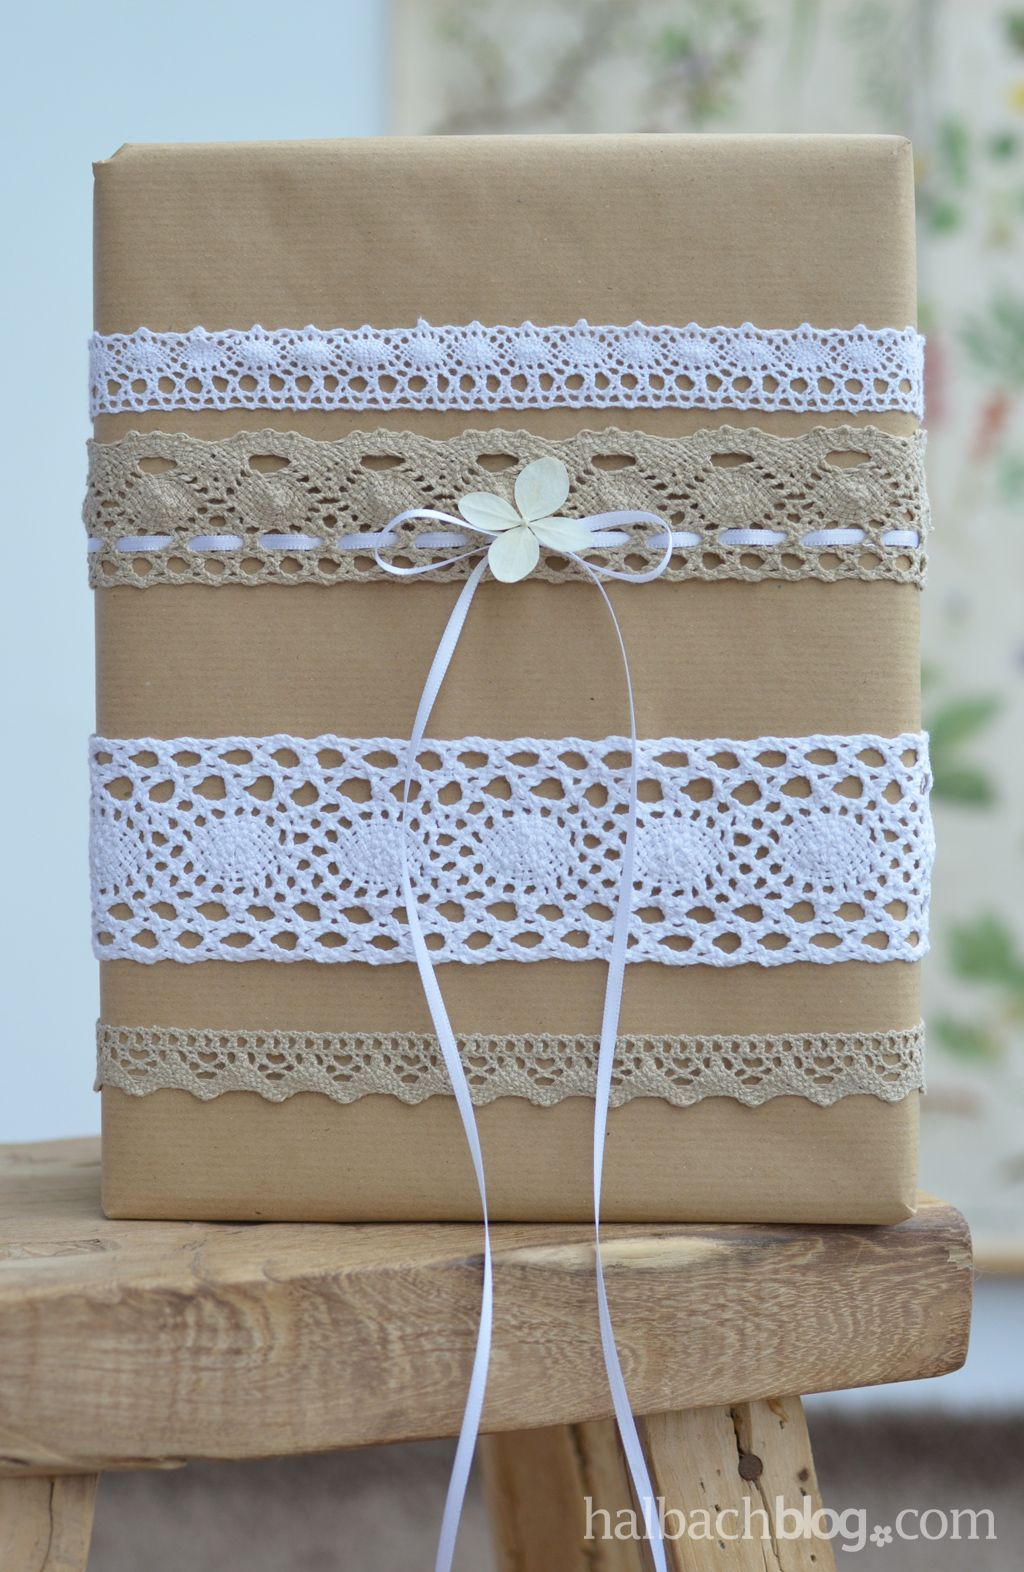 geschenke verpacken mit spitze und packpapier gift wrapping lace craftpaper ribbon. Black Bedroom Furniture Sets. Home Design Ideas